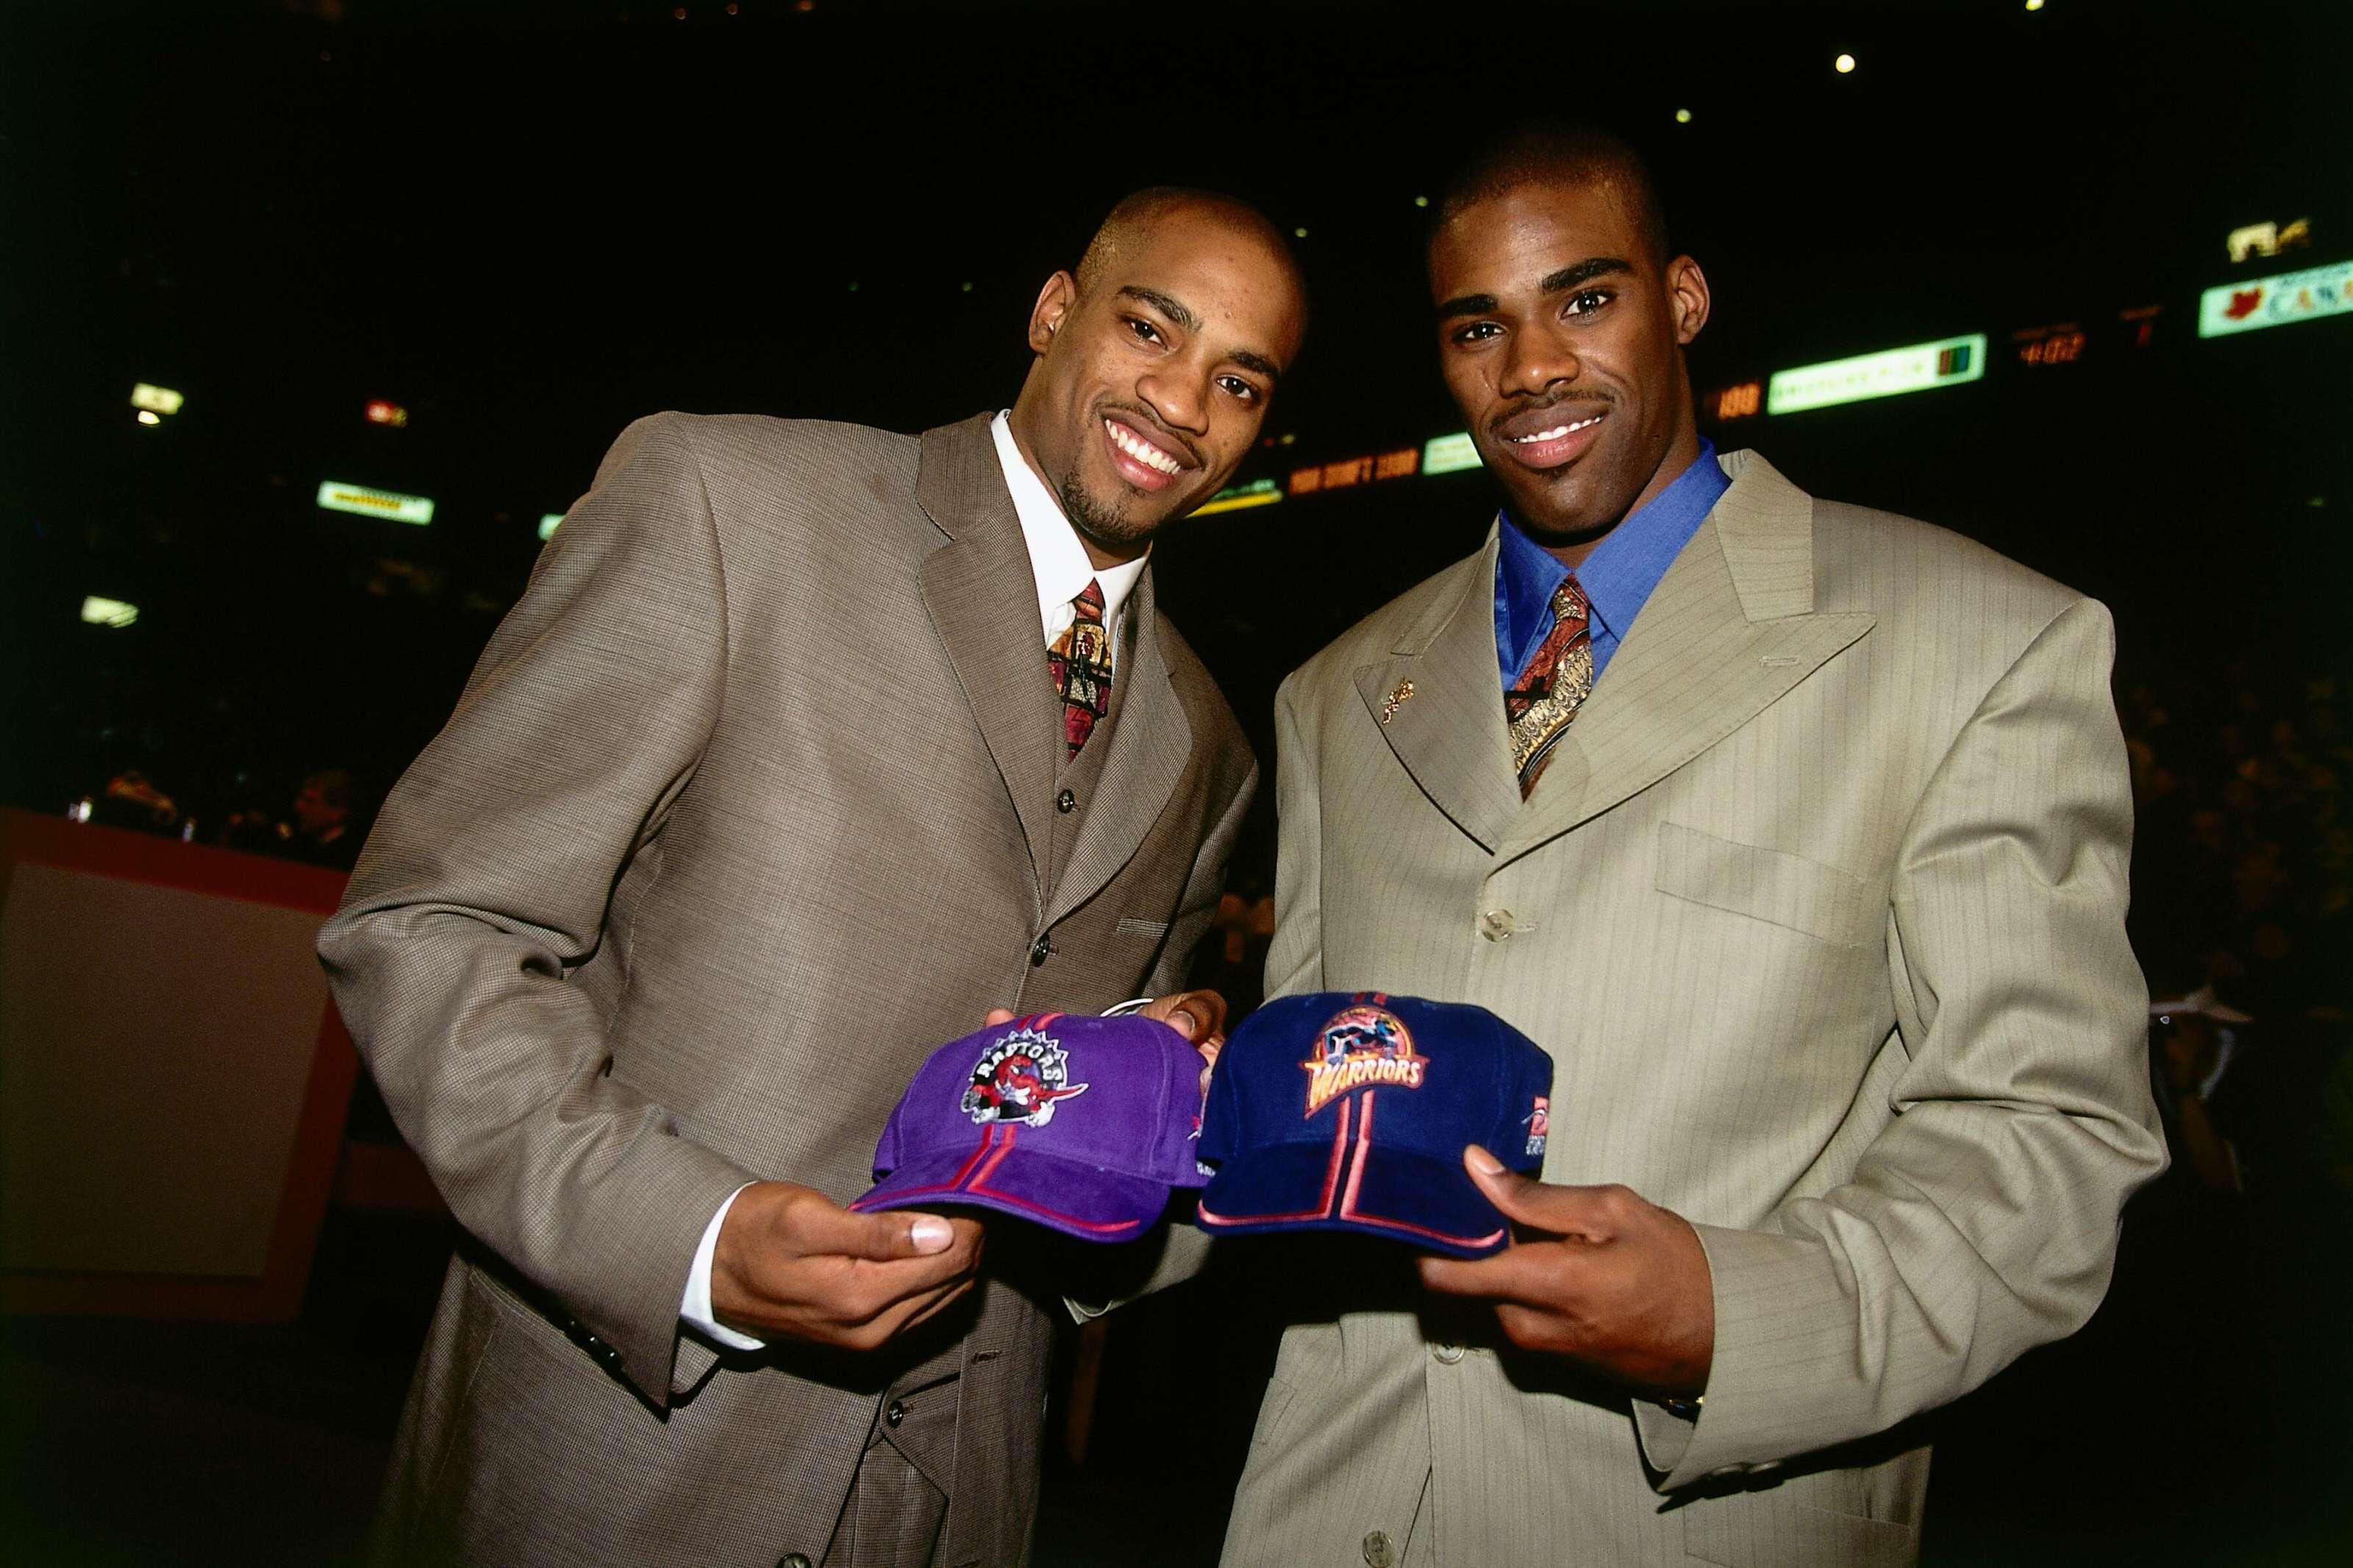 Toronto Raptors: 23 days of history - trading for Vince Carter